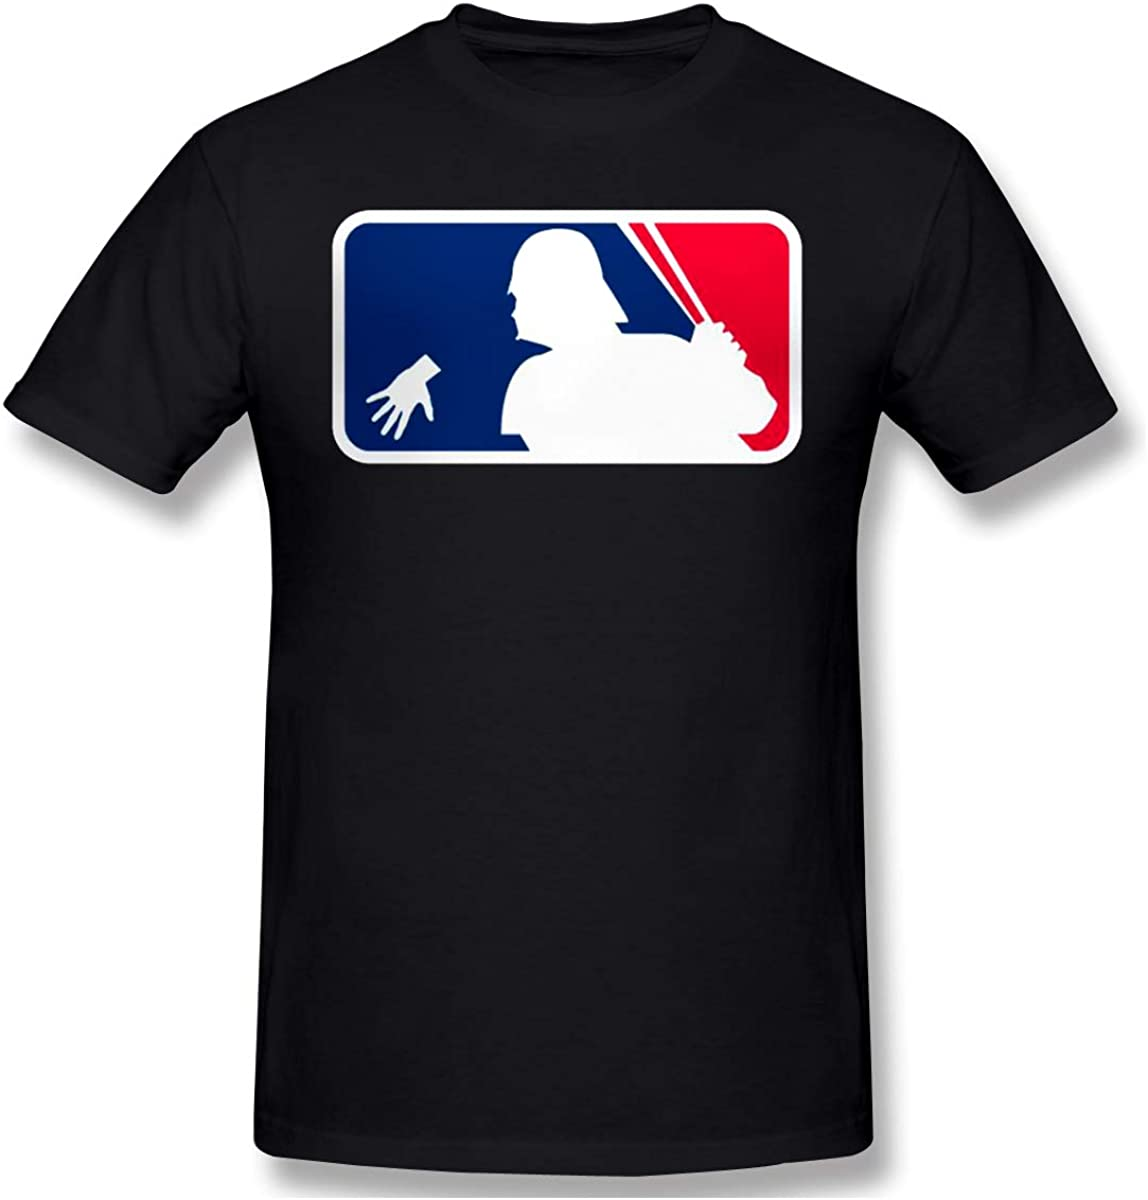 Major League Jedi Star Wars Light Sabre Tshirt